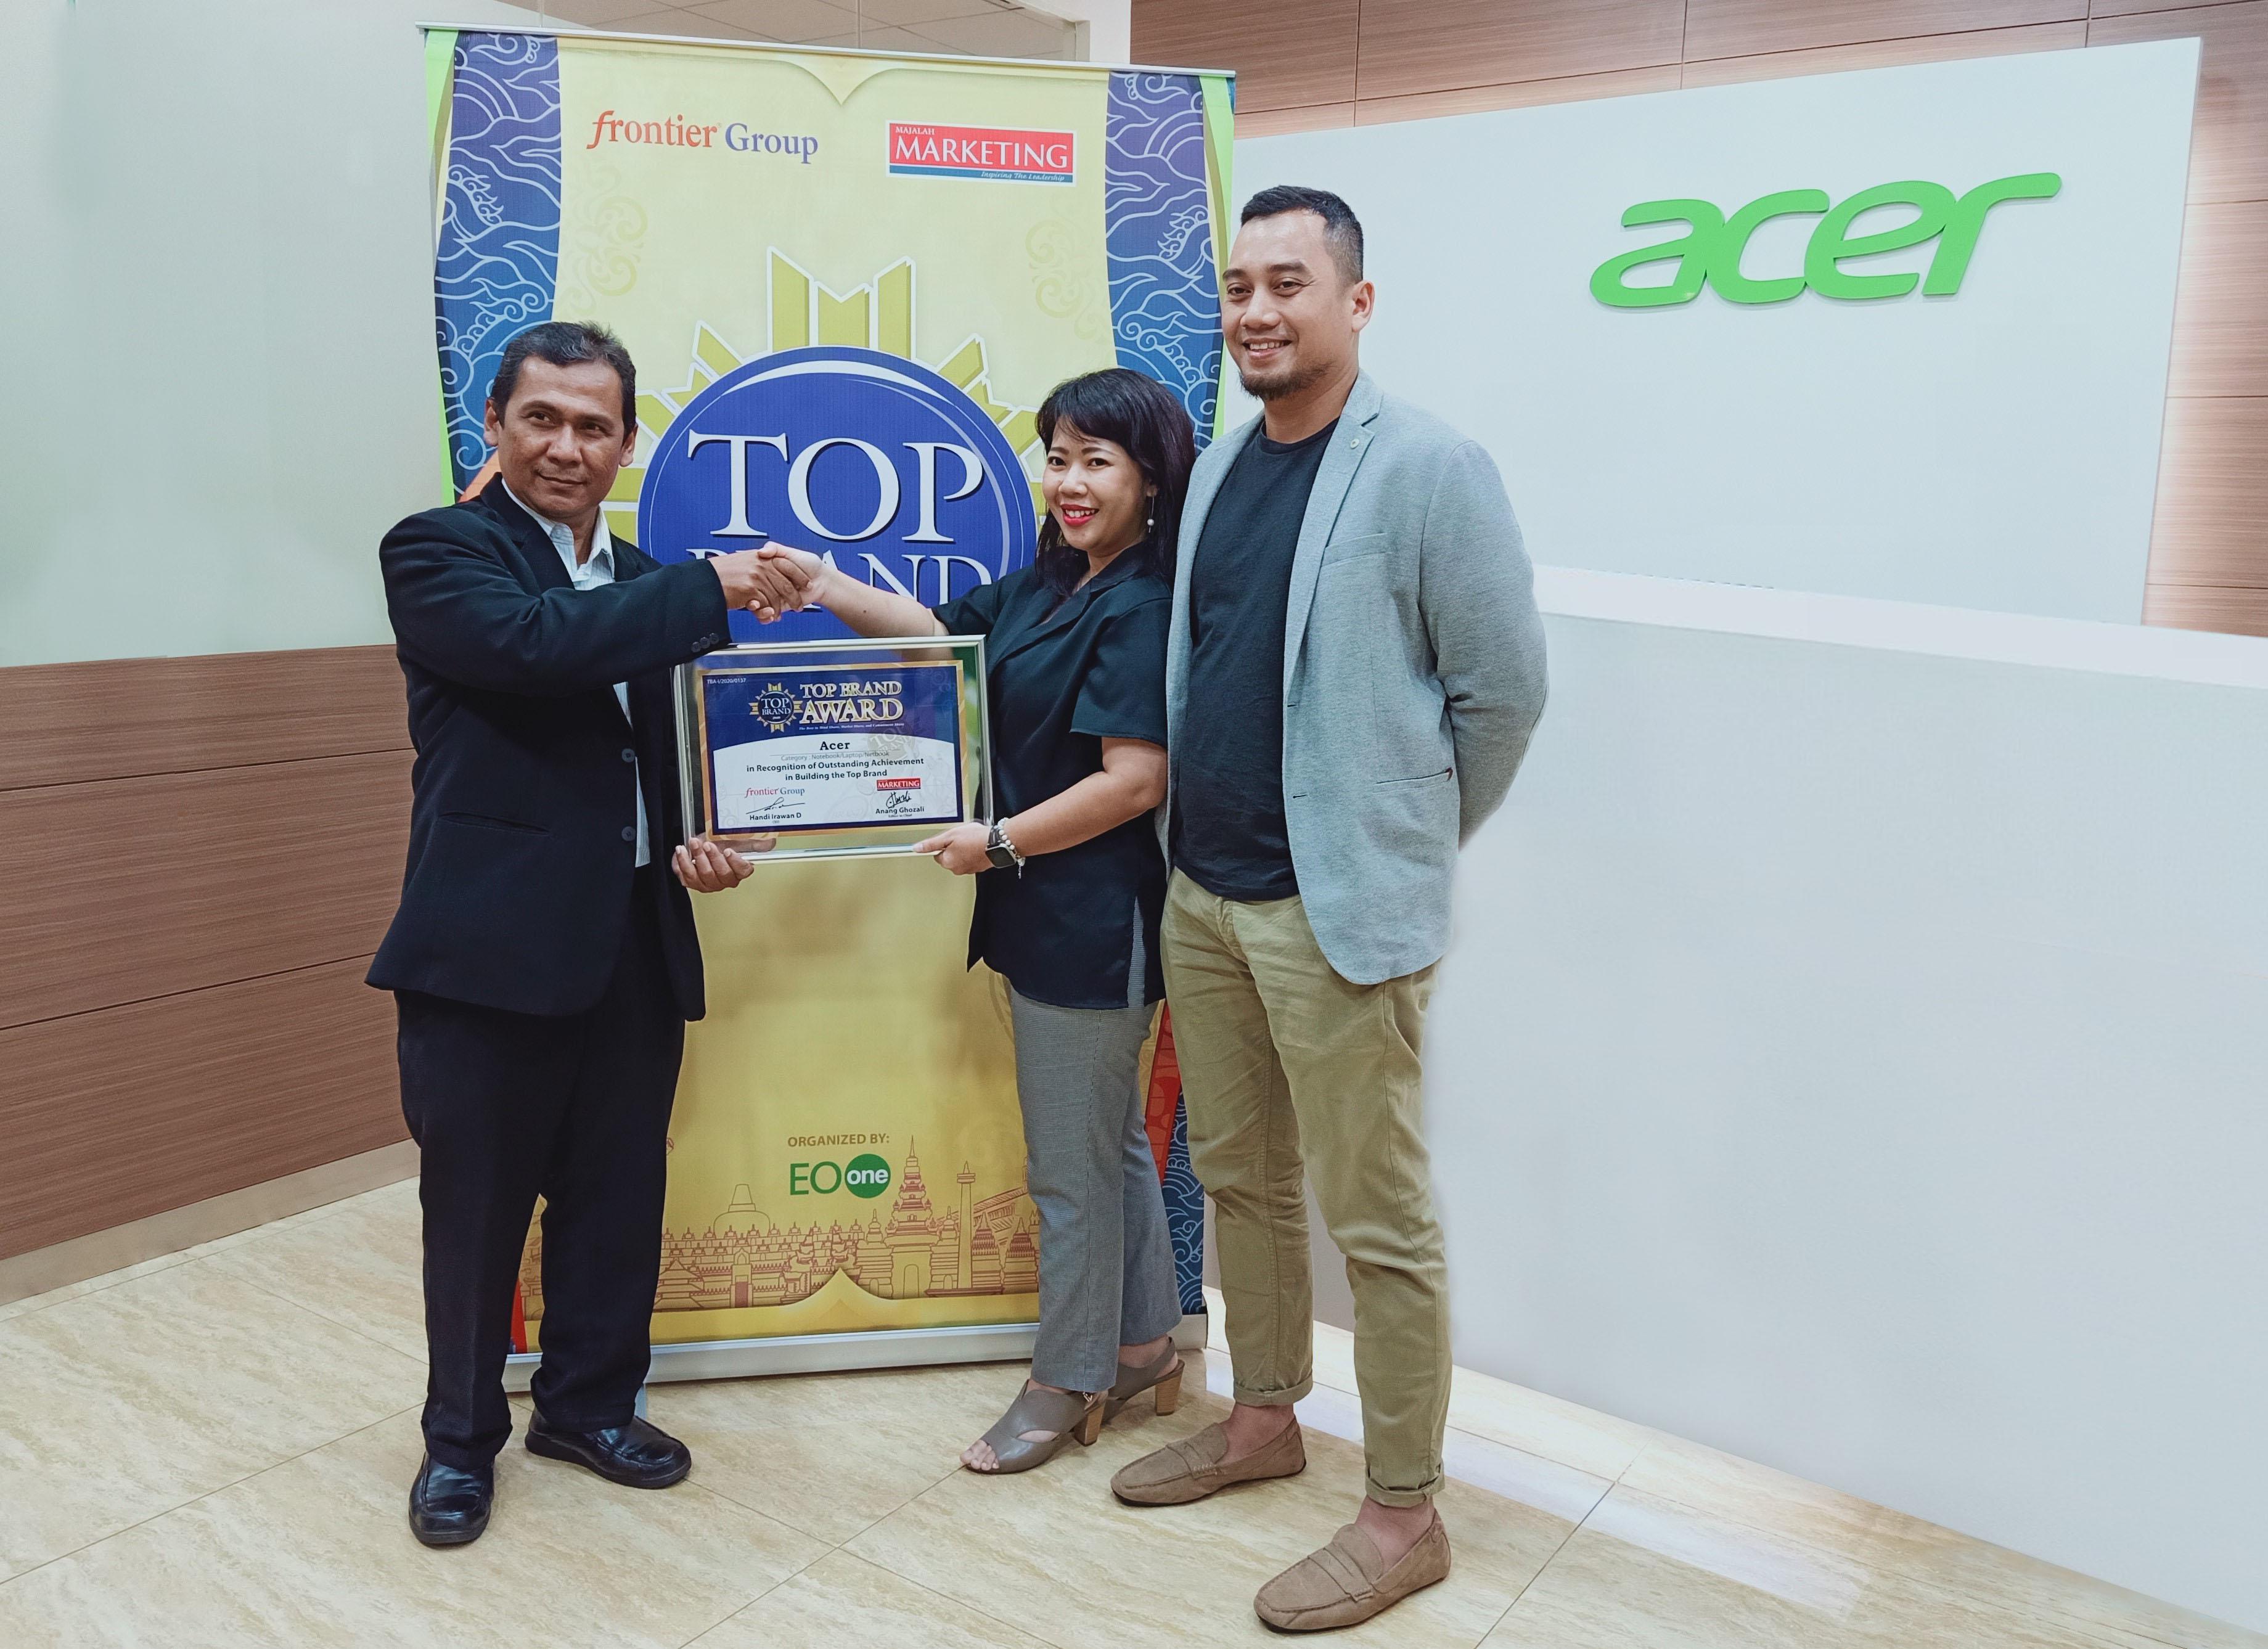 Foto 2 - Top Brand Award 2020 Acer Indonesia - Anang Ghozali, Anandita Puspitasari, Renaldy Felani